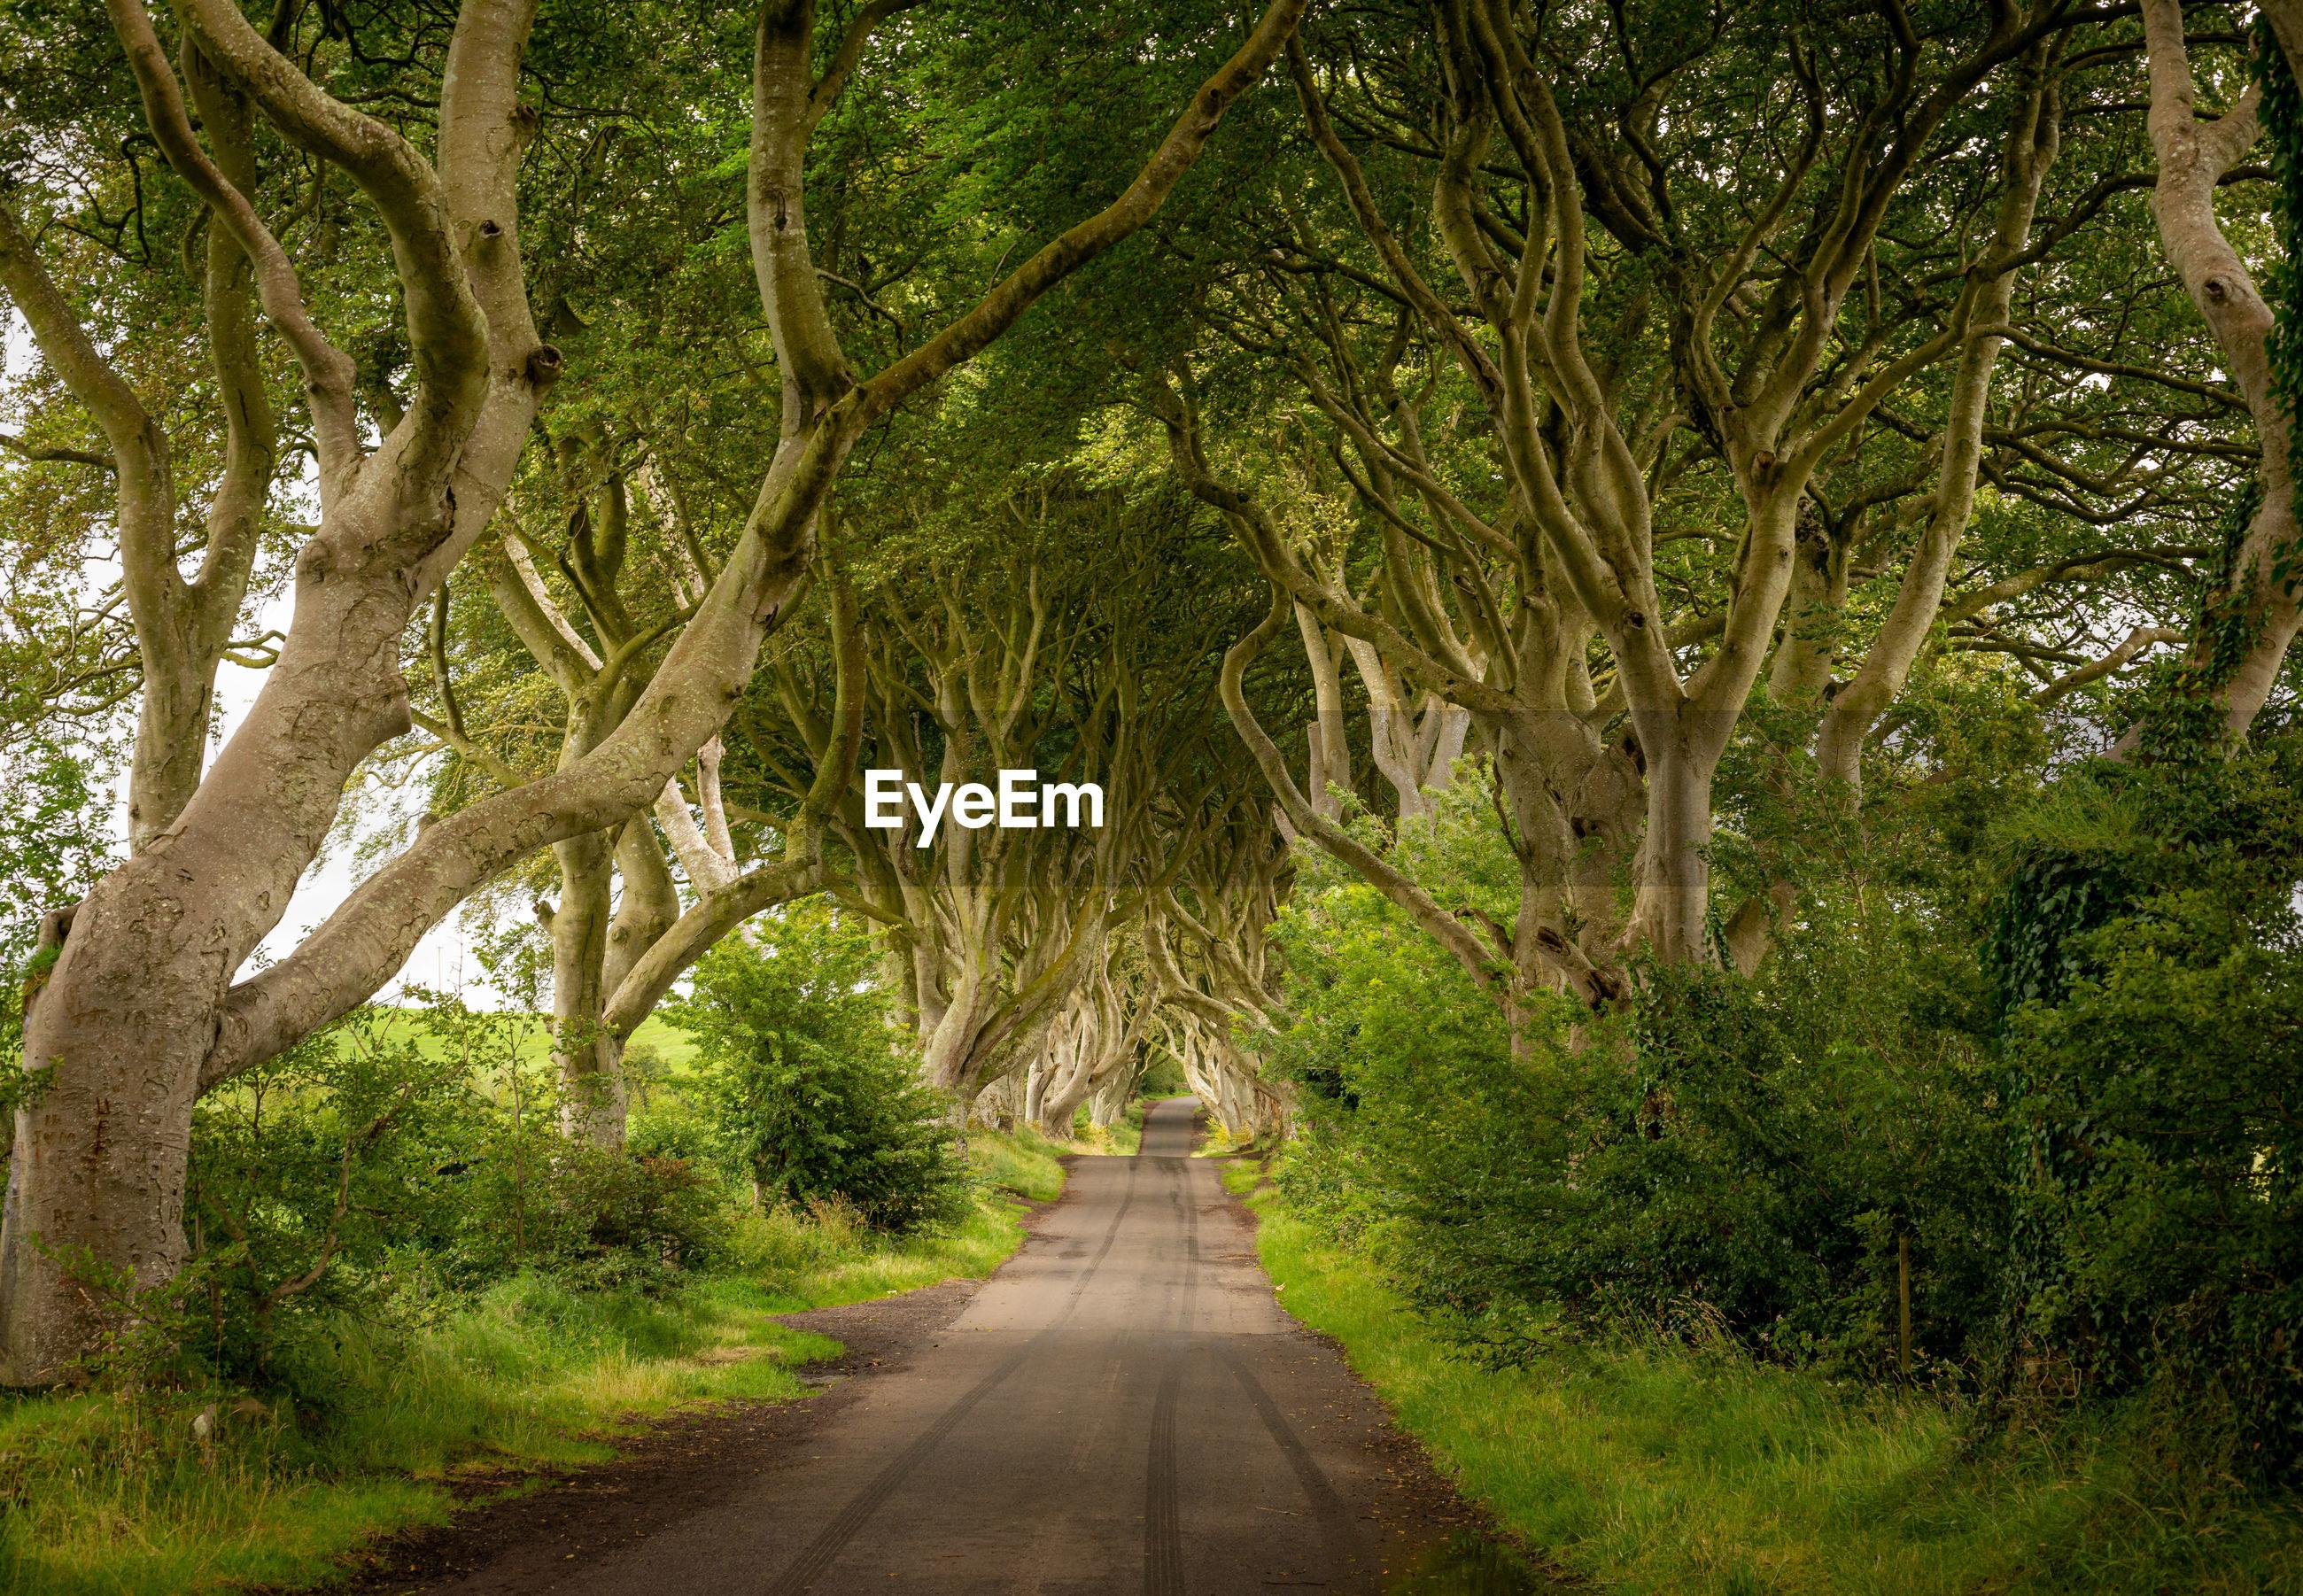 ROAD AMIDST TREES